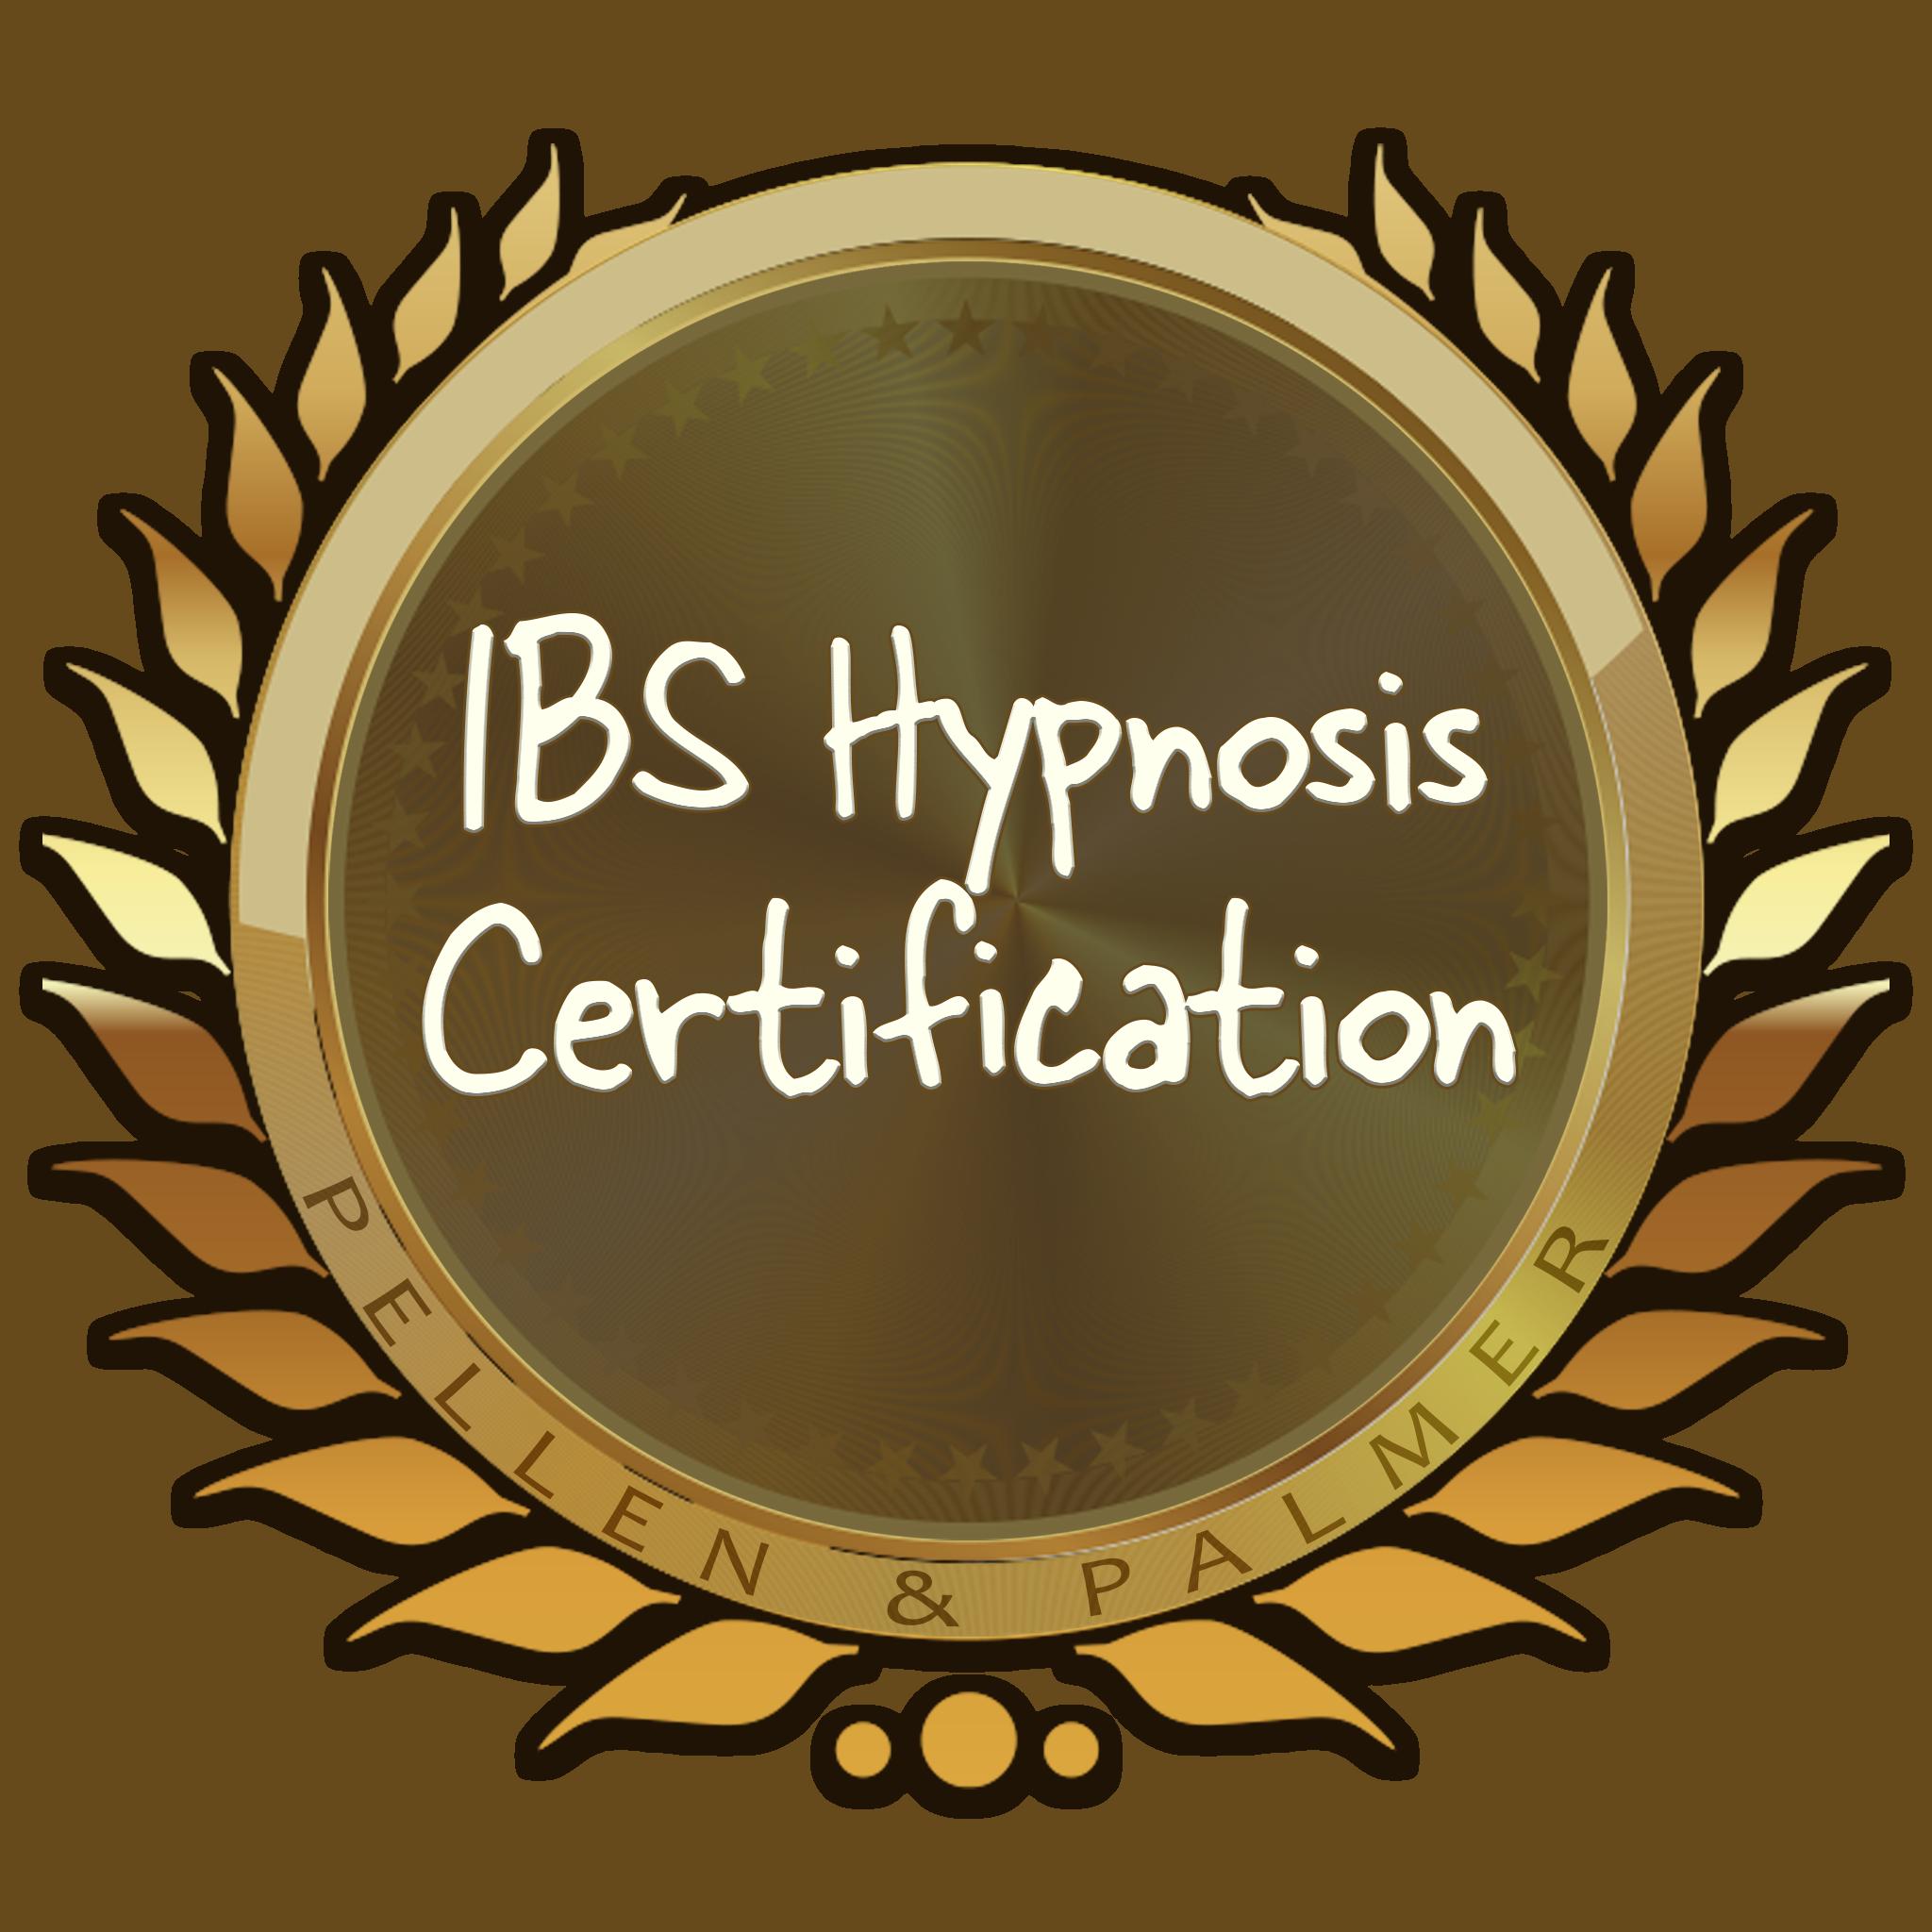 badge_ibs hypnosis.png